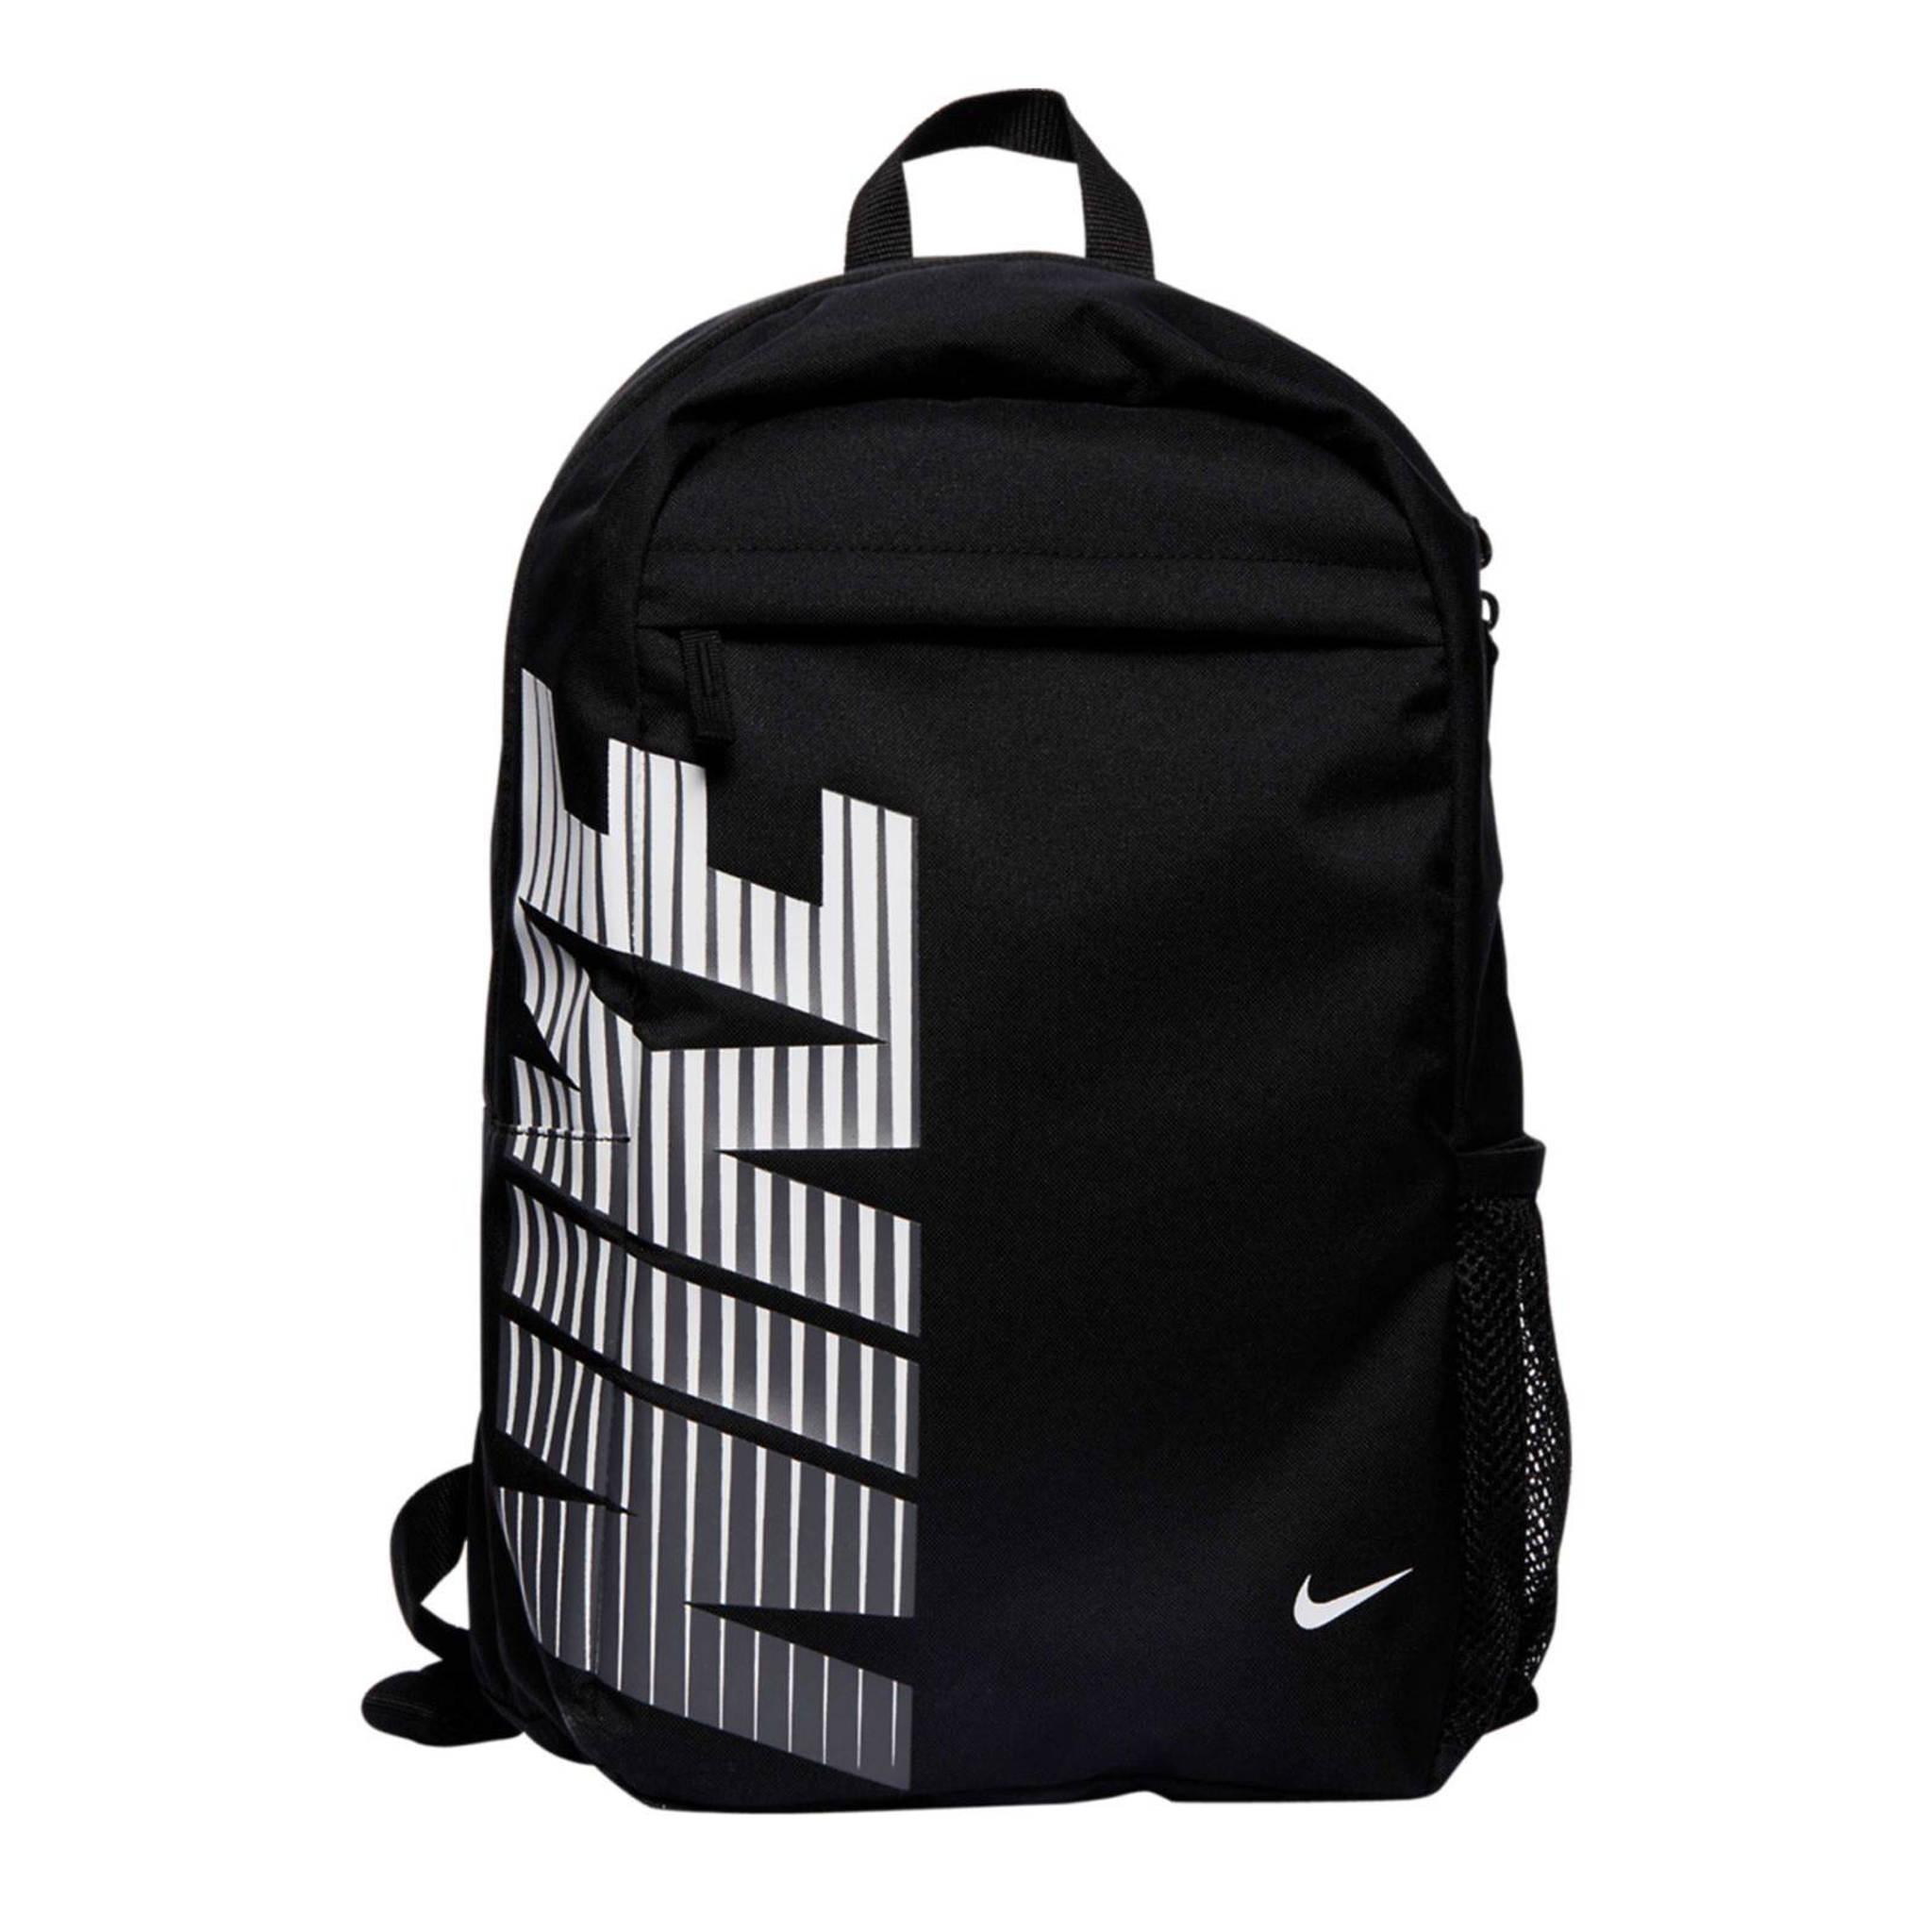 0b44b29fc0b Nike rugzak | wehkamp